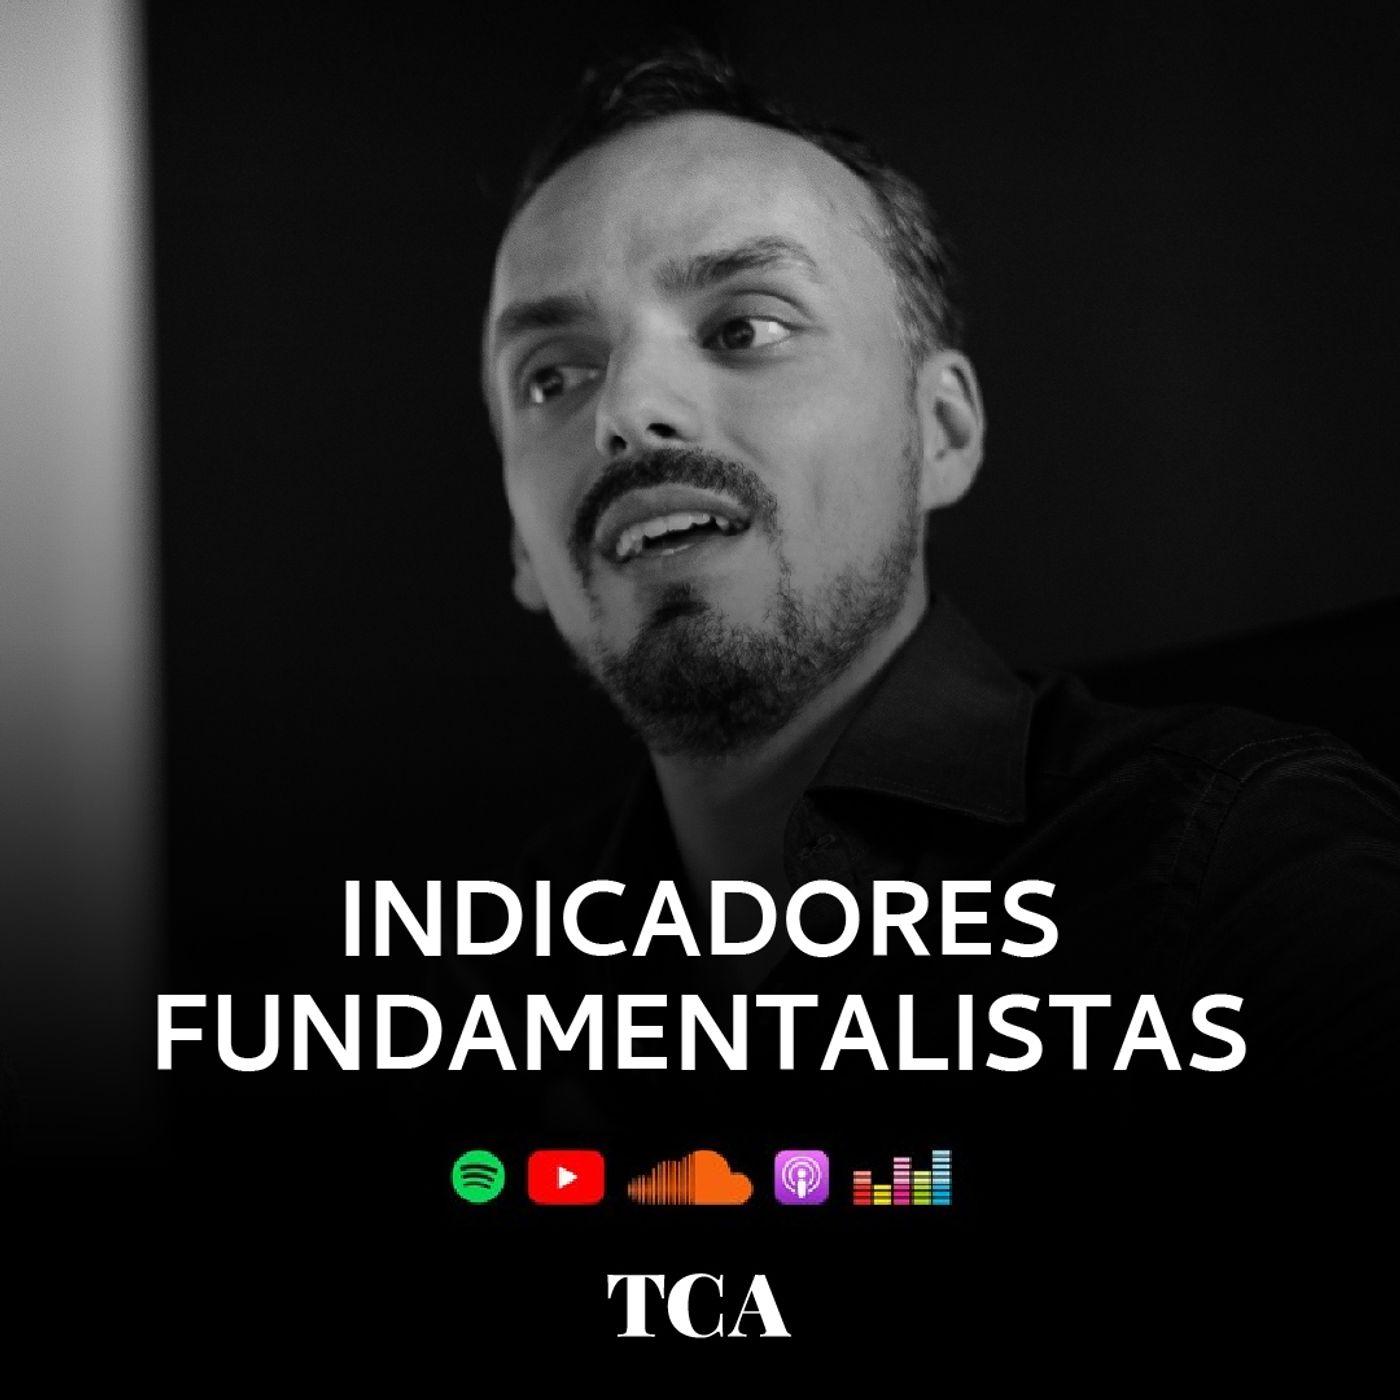 Indicadores fundamentalistas essenciais